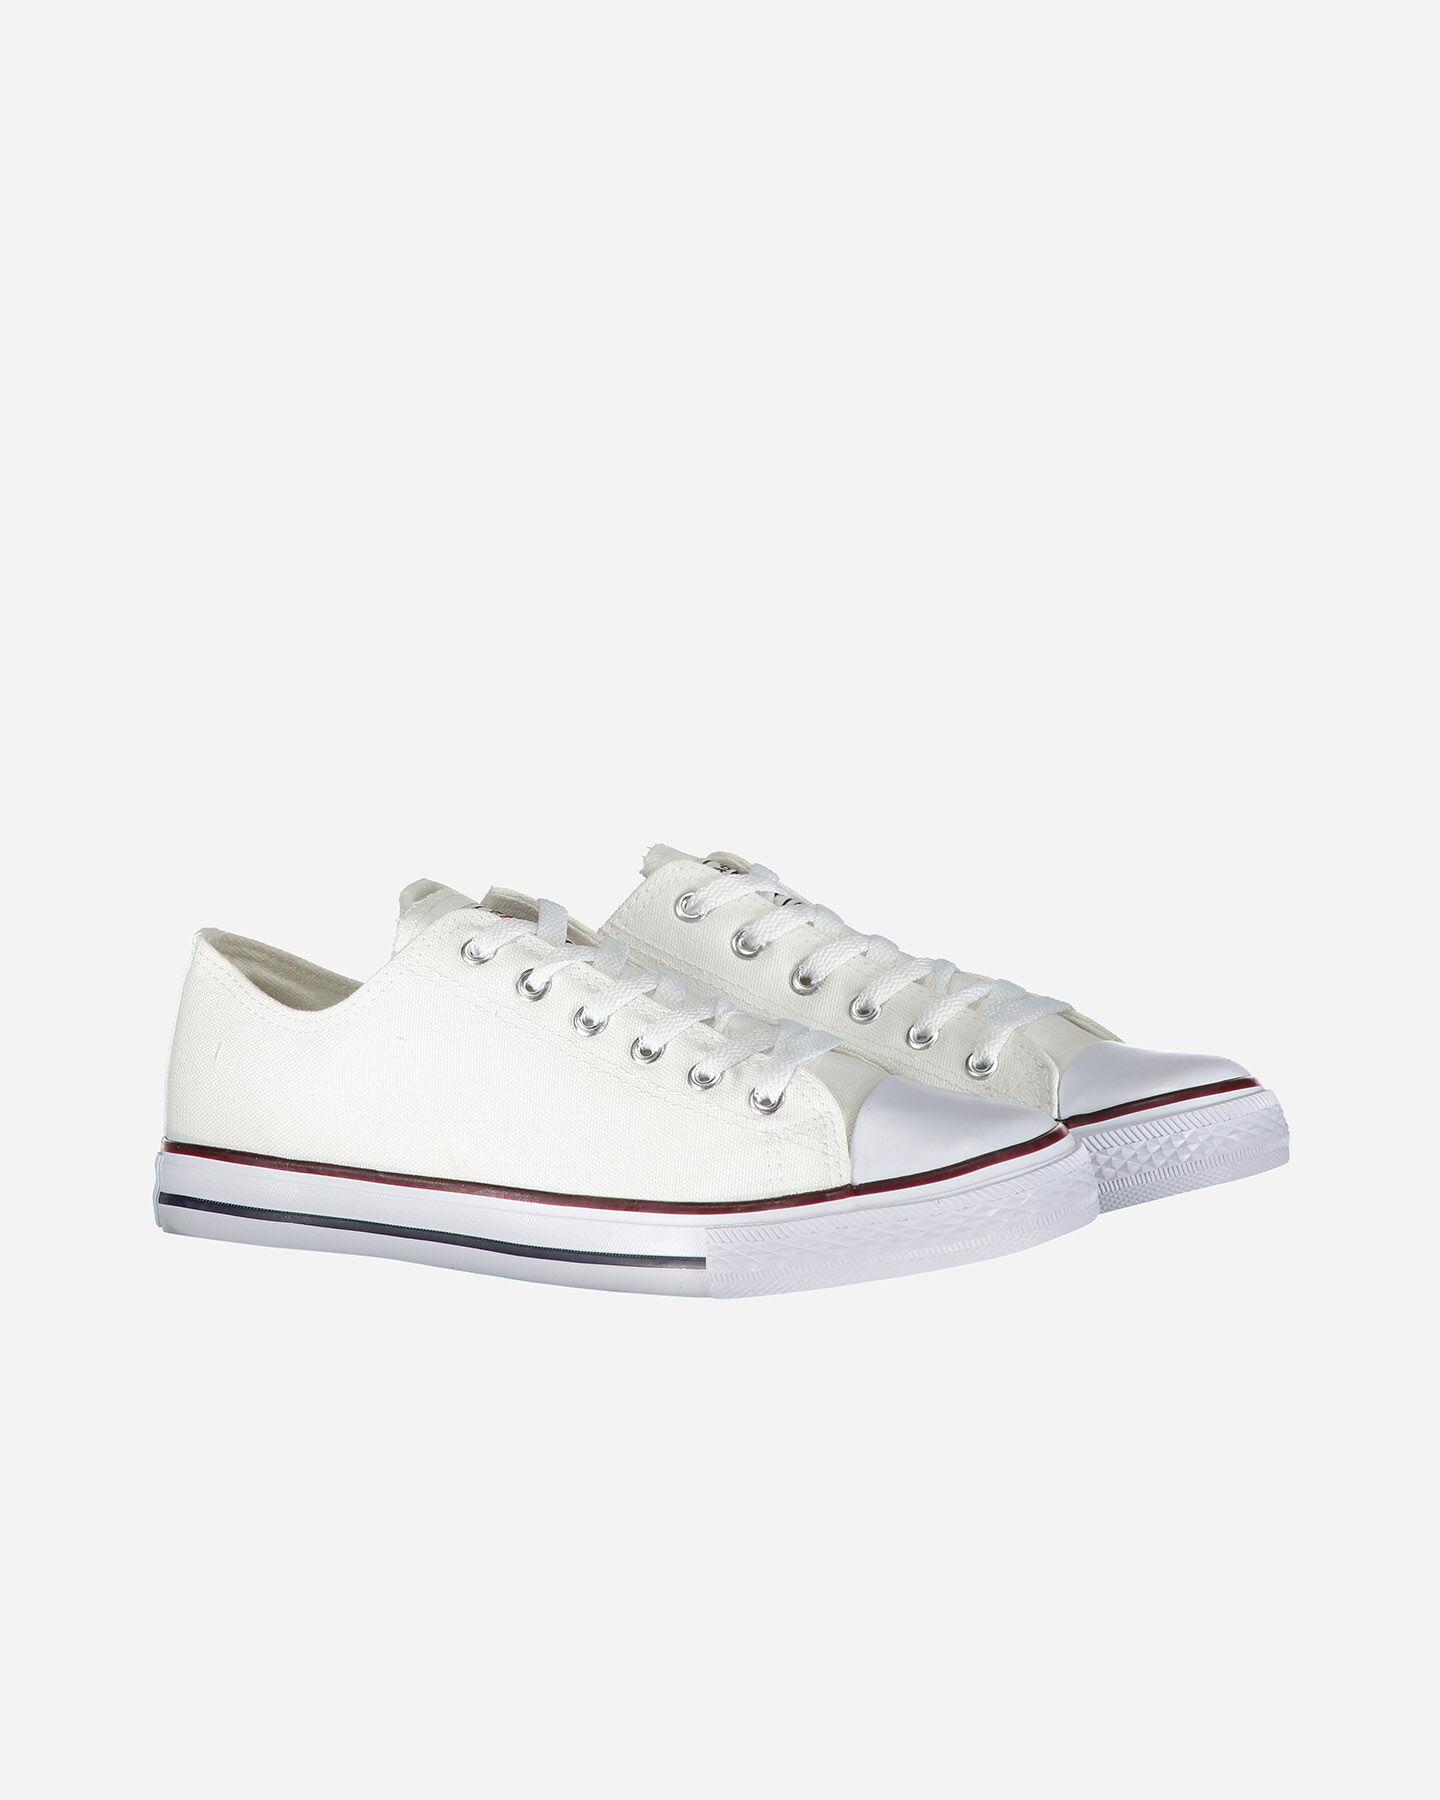 Scarpe sneakers ADMIRAL CANVAS LOW 2.0 M S4065381 scatto 1